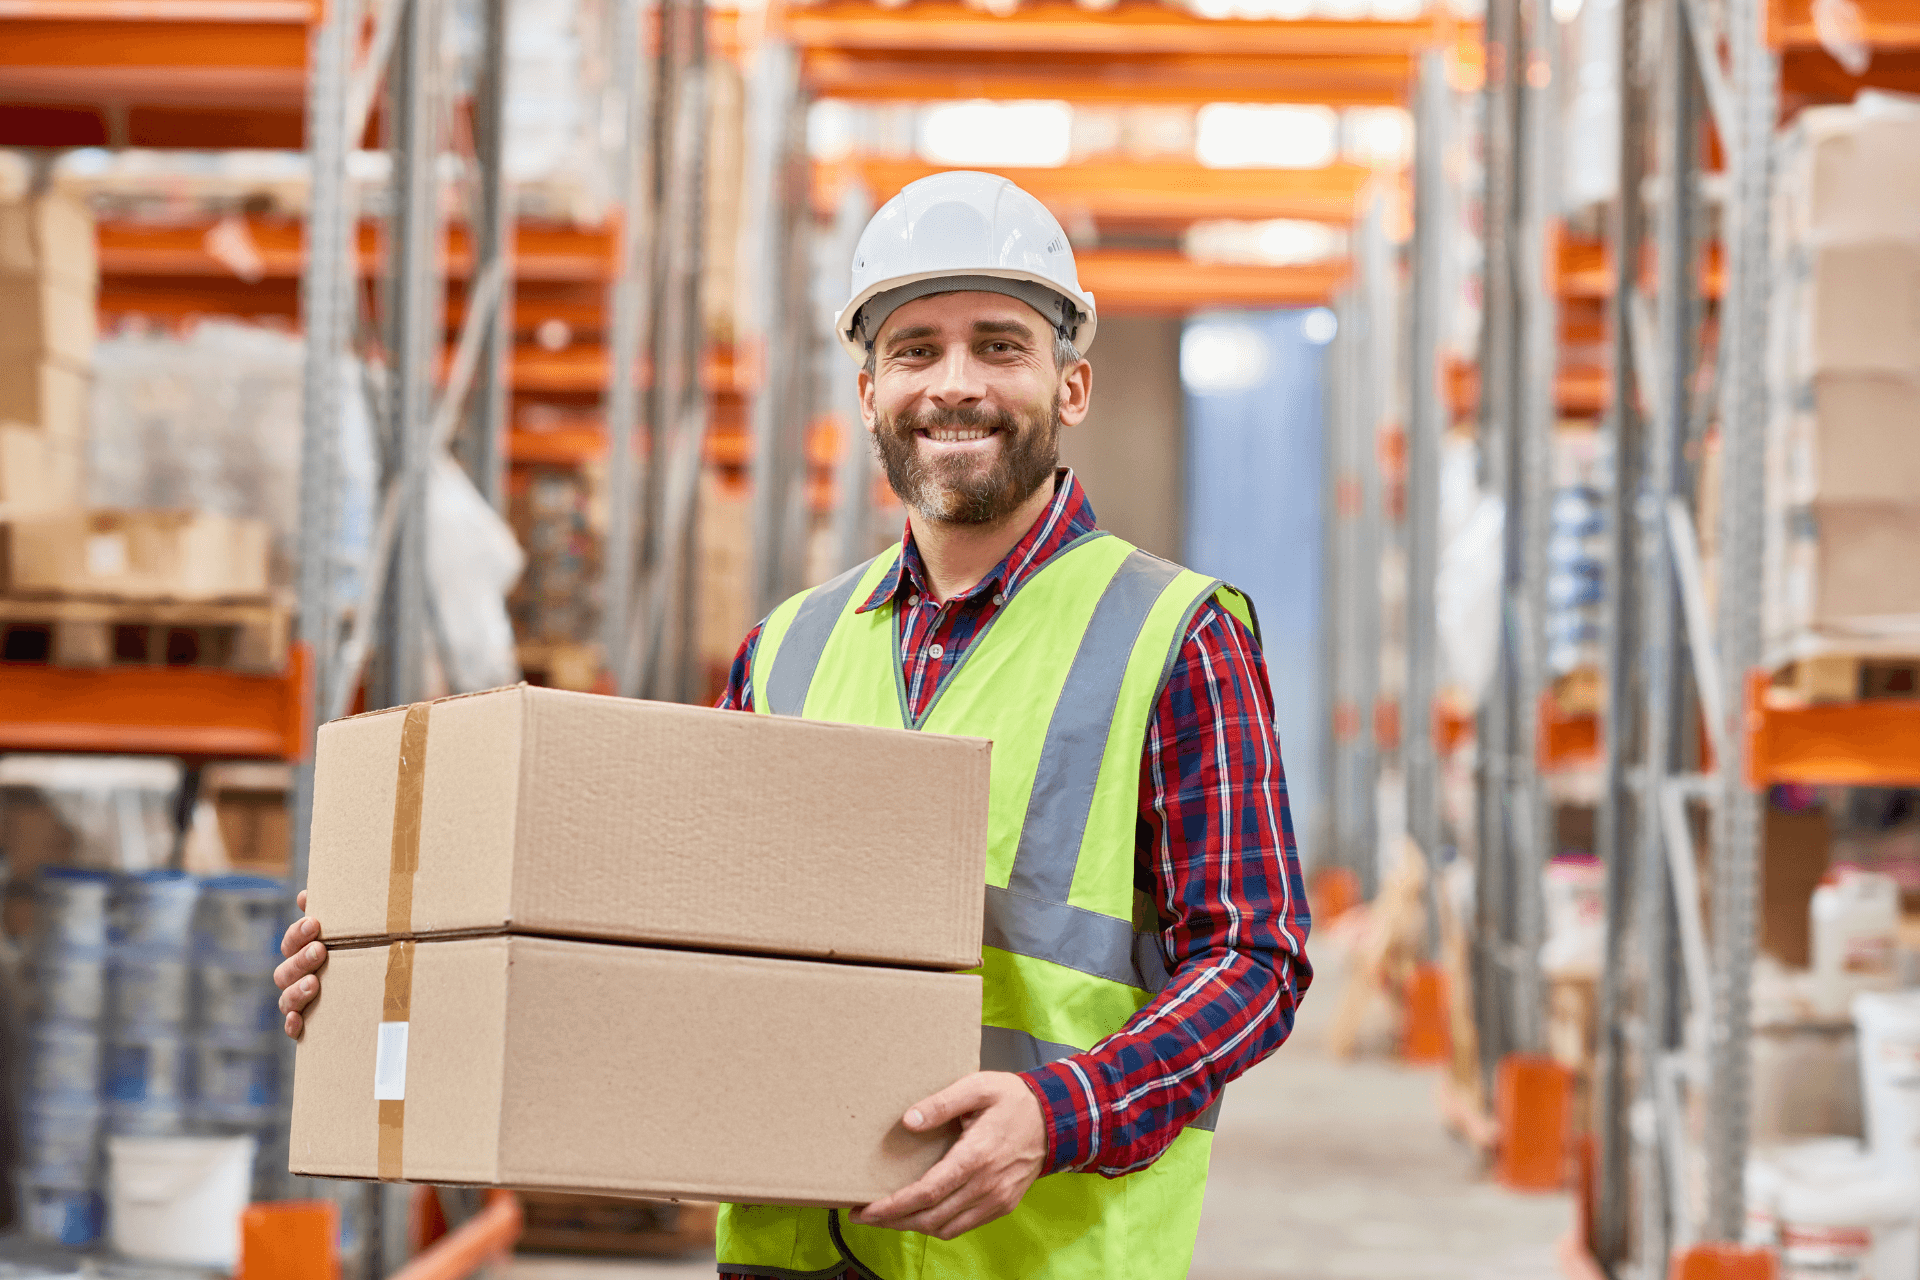 warehouse storage, warehouse management, distribution warehouse, 3pl, ecommerce fulfilment